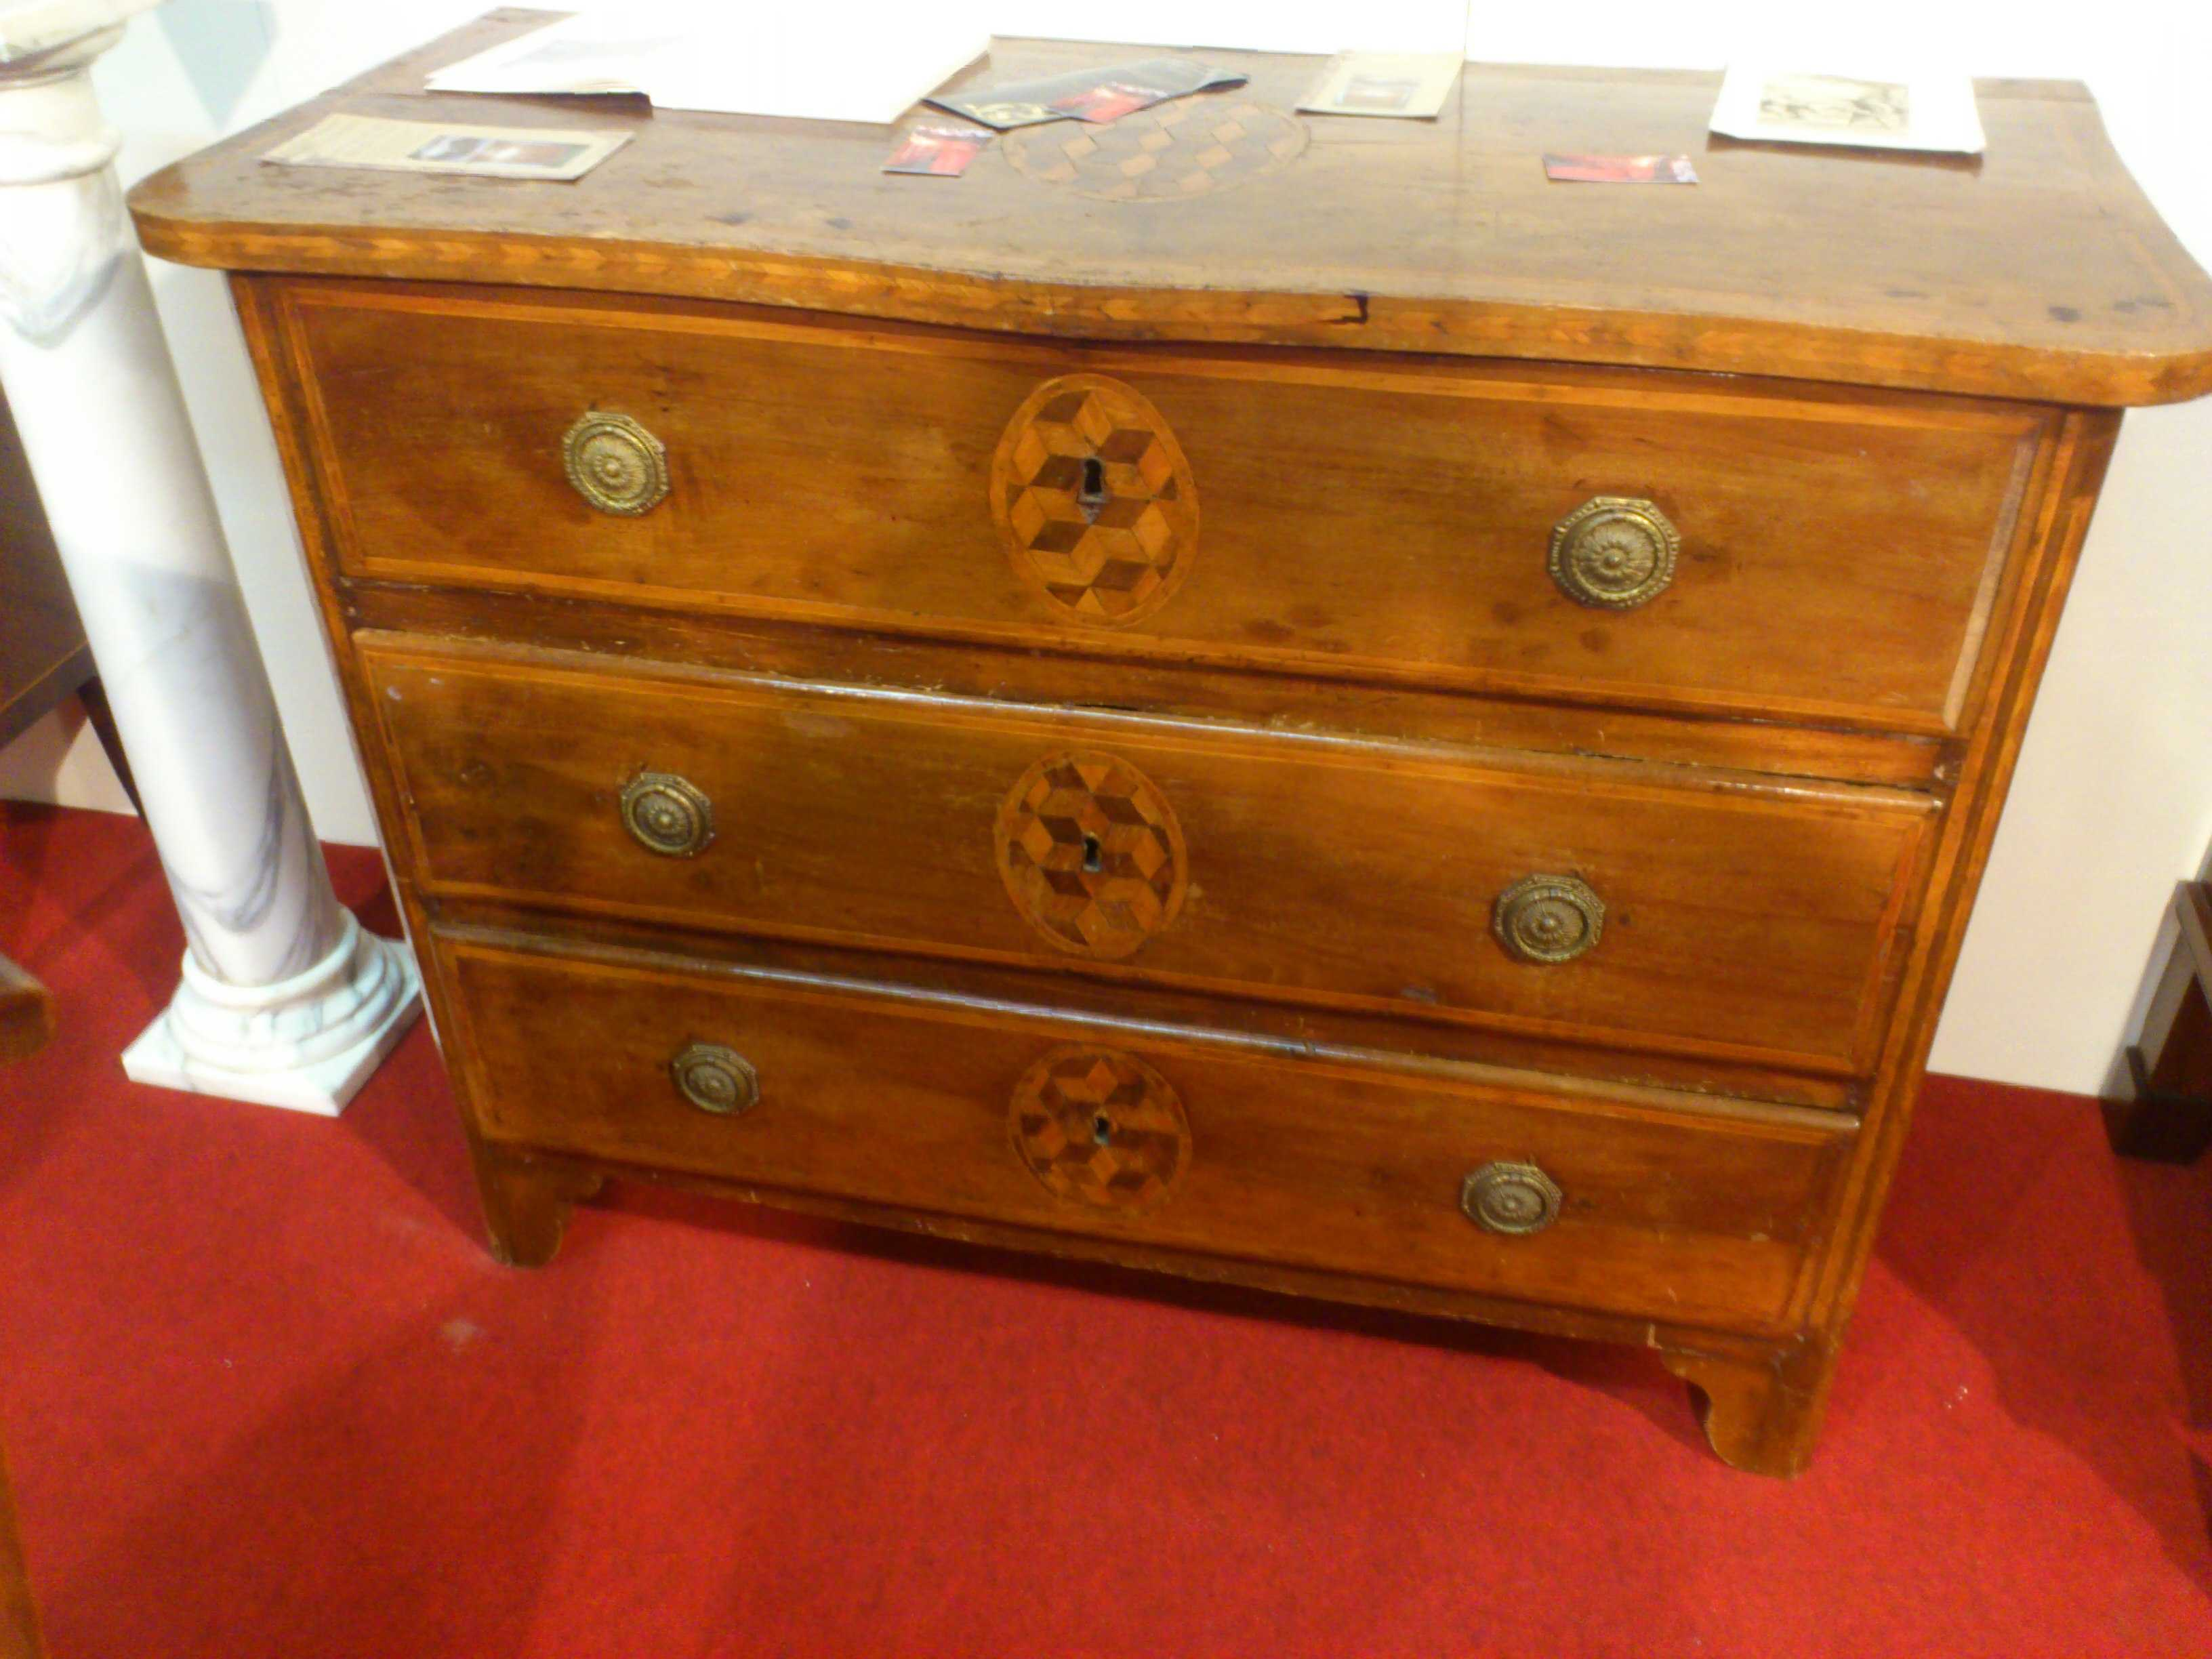 Cassettone luigi xv arredamento mobili antiquariato for Antiquariato mobili